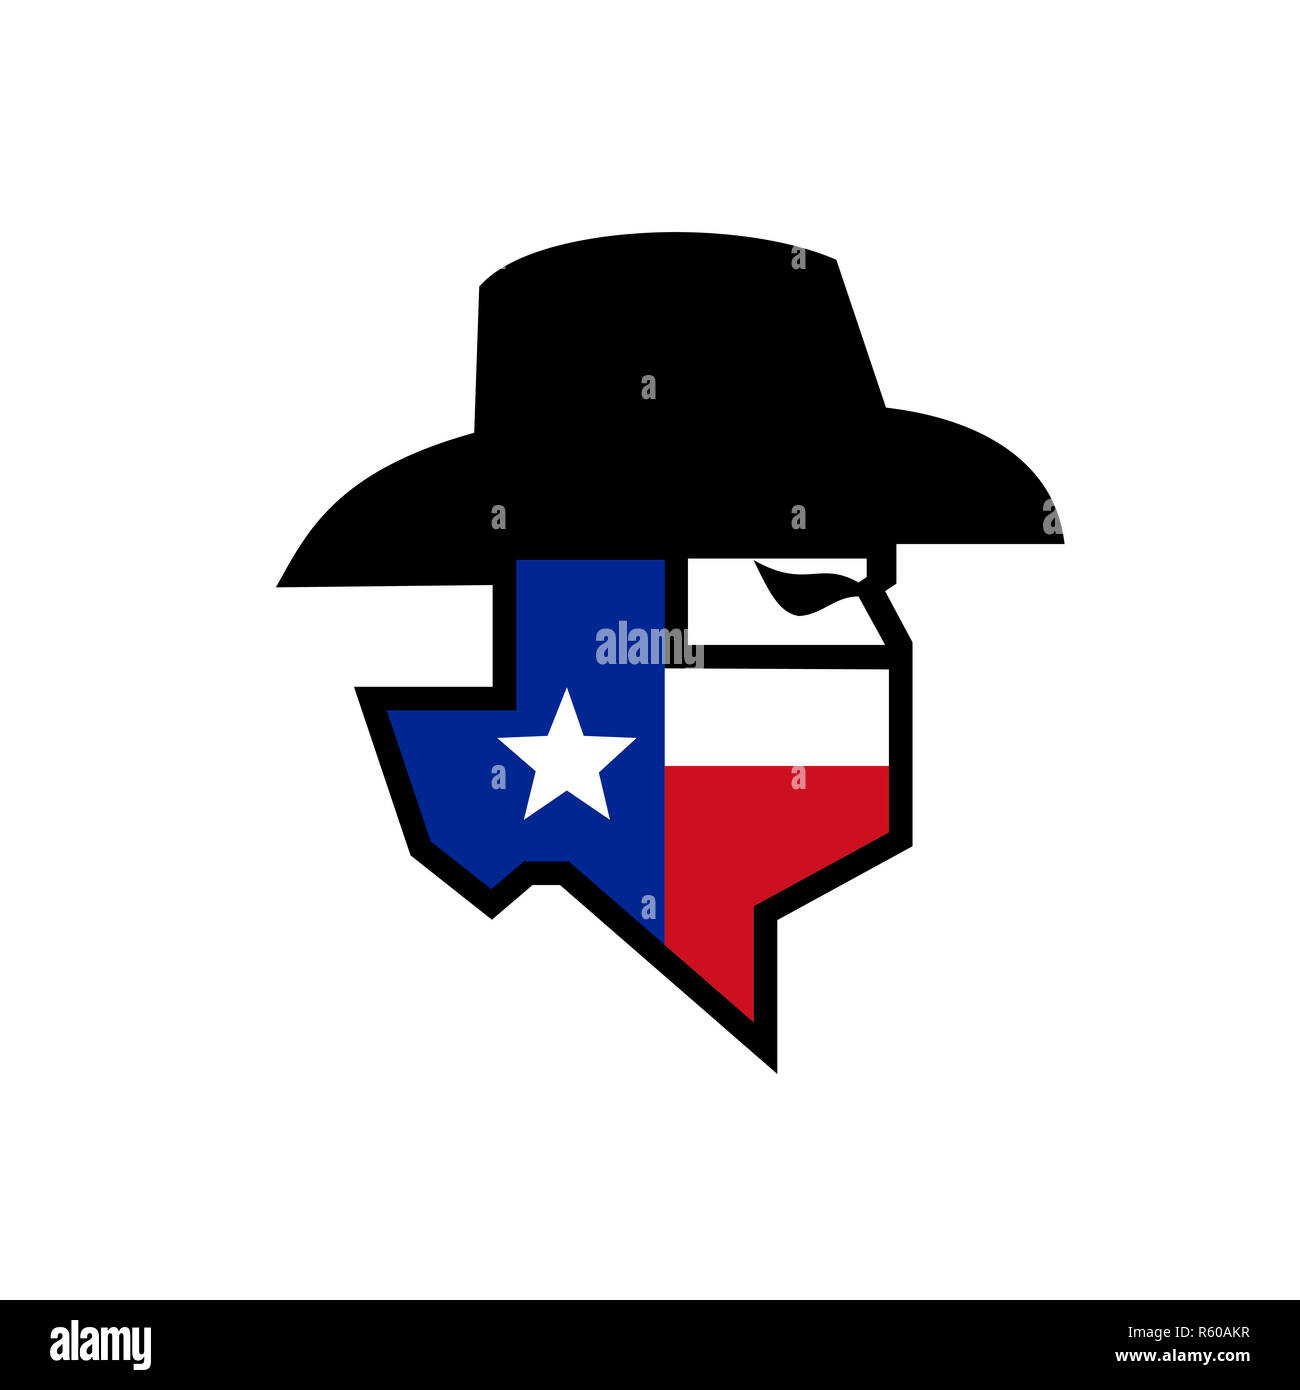 bc7ef0e5365 Bandit Texas Flag Icon Stock Photo  227431115 - Alamy